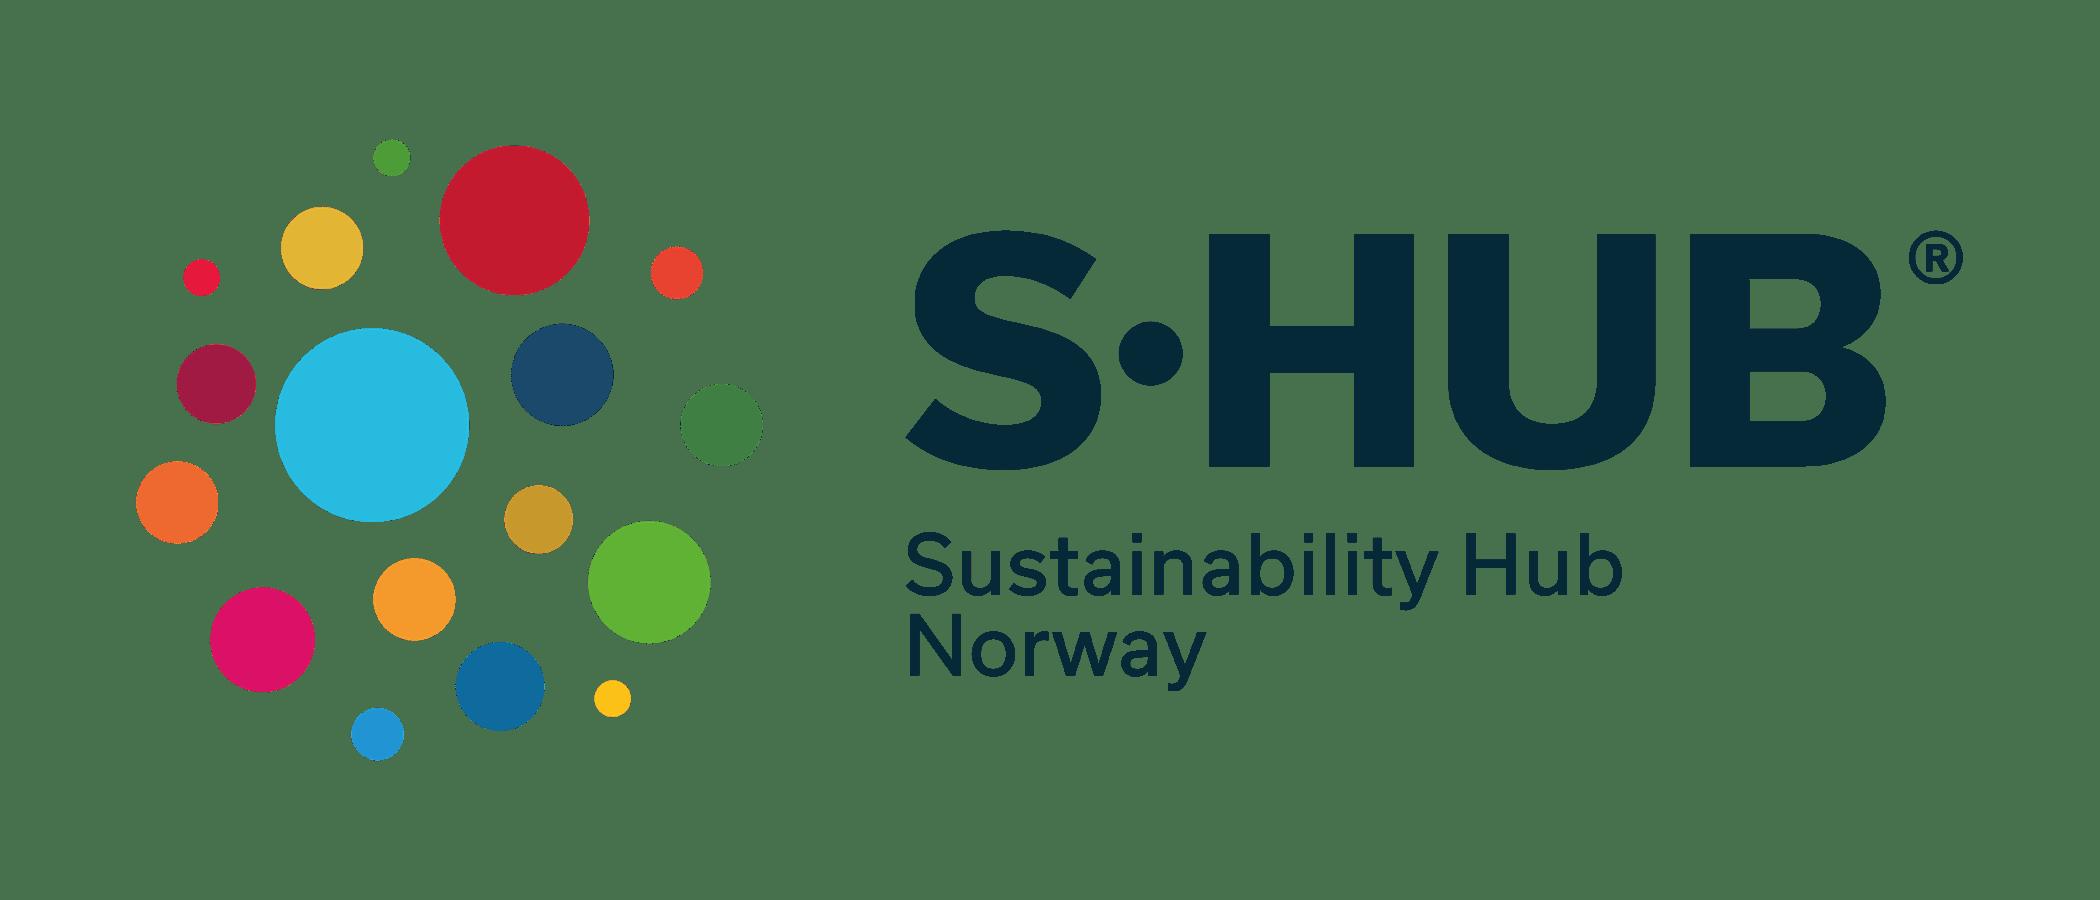 SHUB_logo-01.png